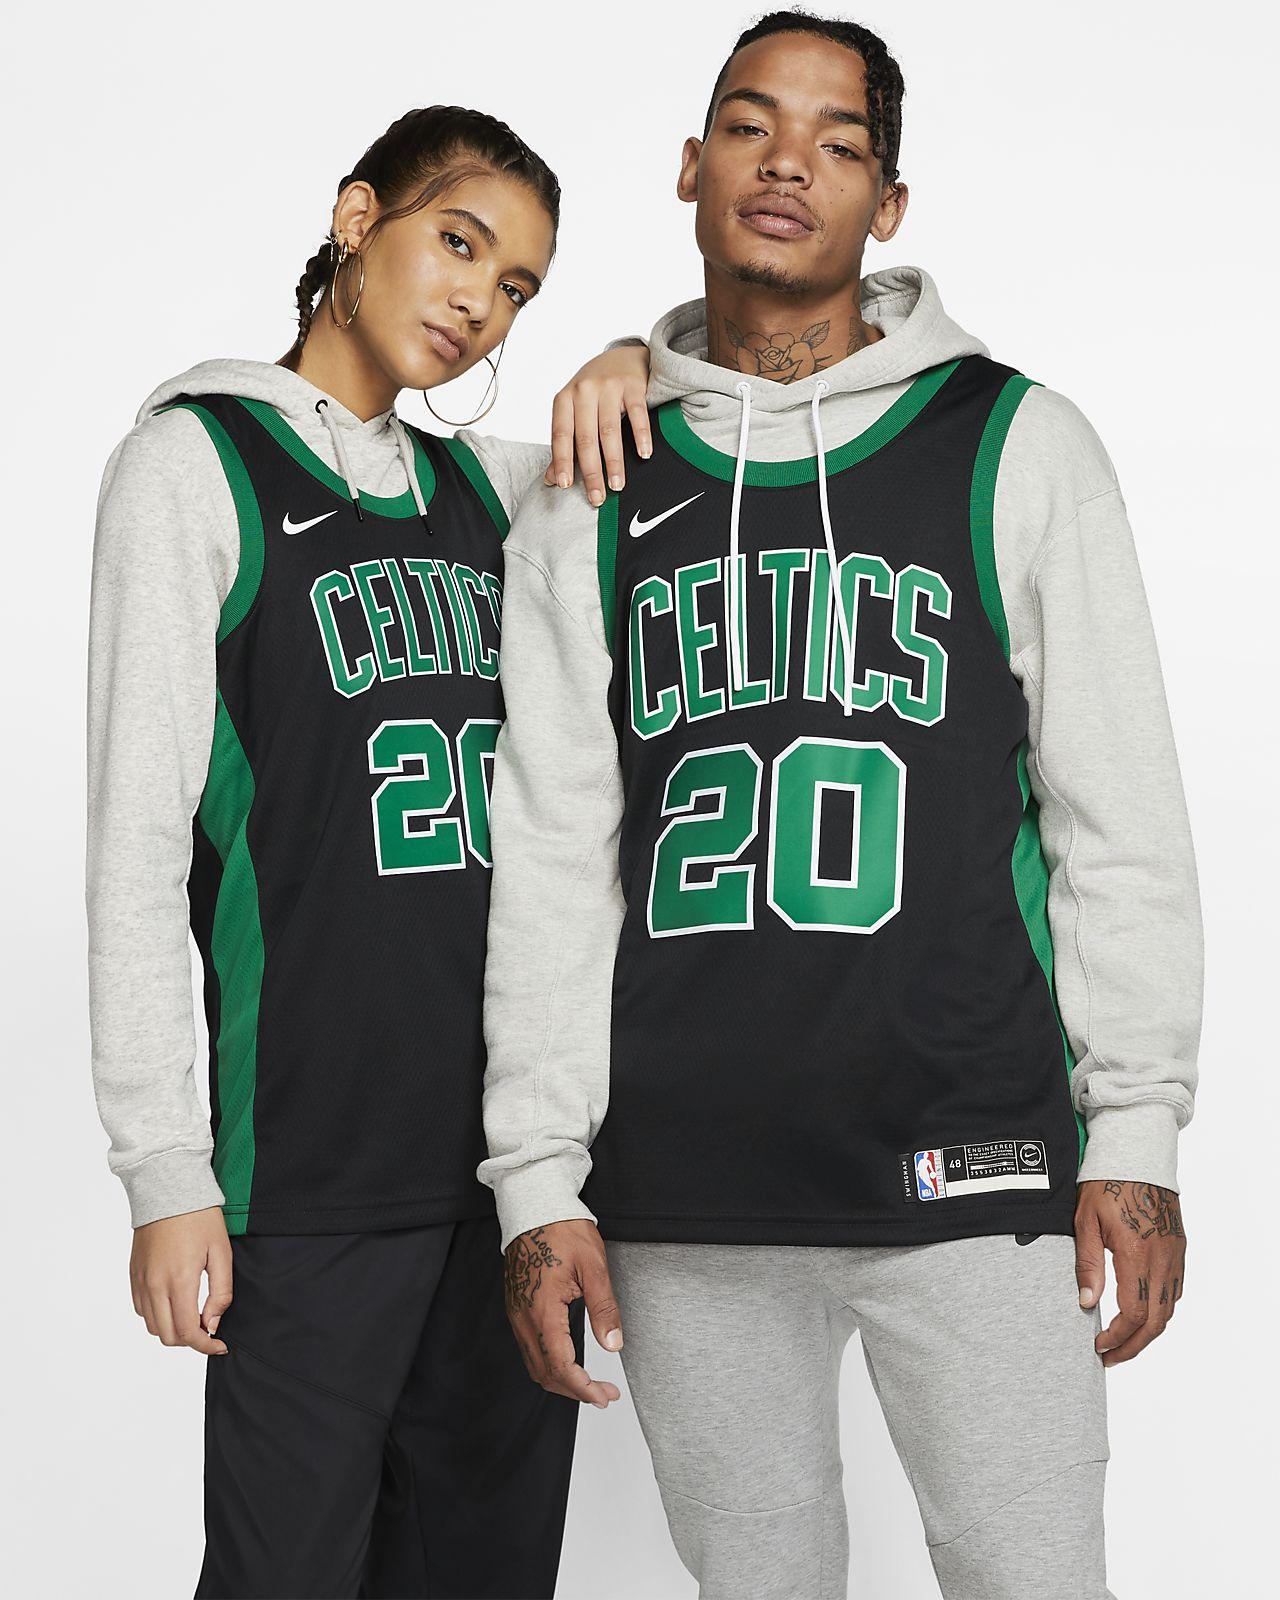 f2dc6b38e20 Men's Nike NBA Connected Jersey. Gordon Hayward Statement Edition Swingman (Boston  Celtics)